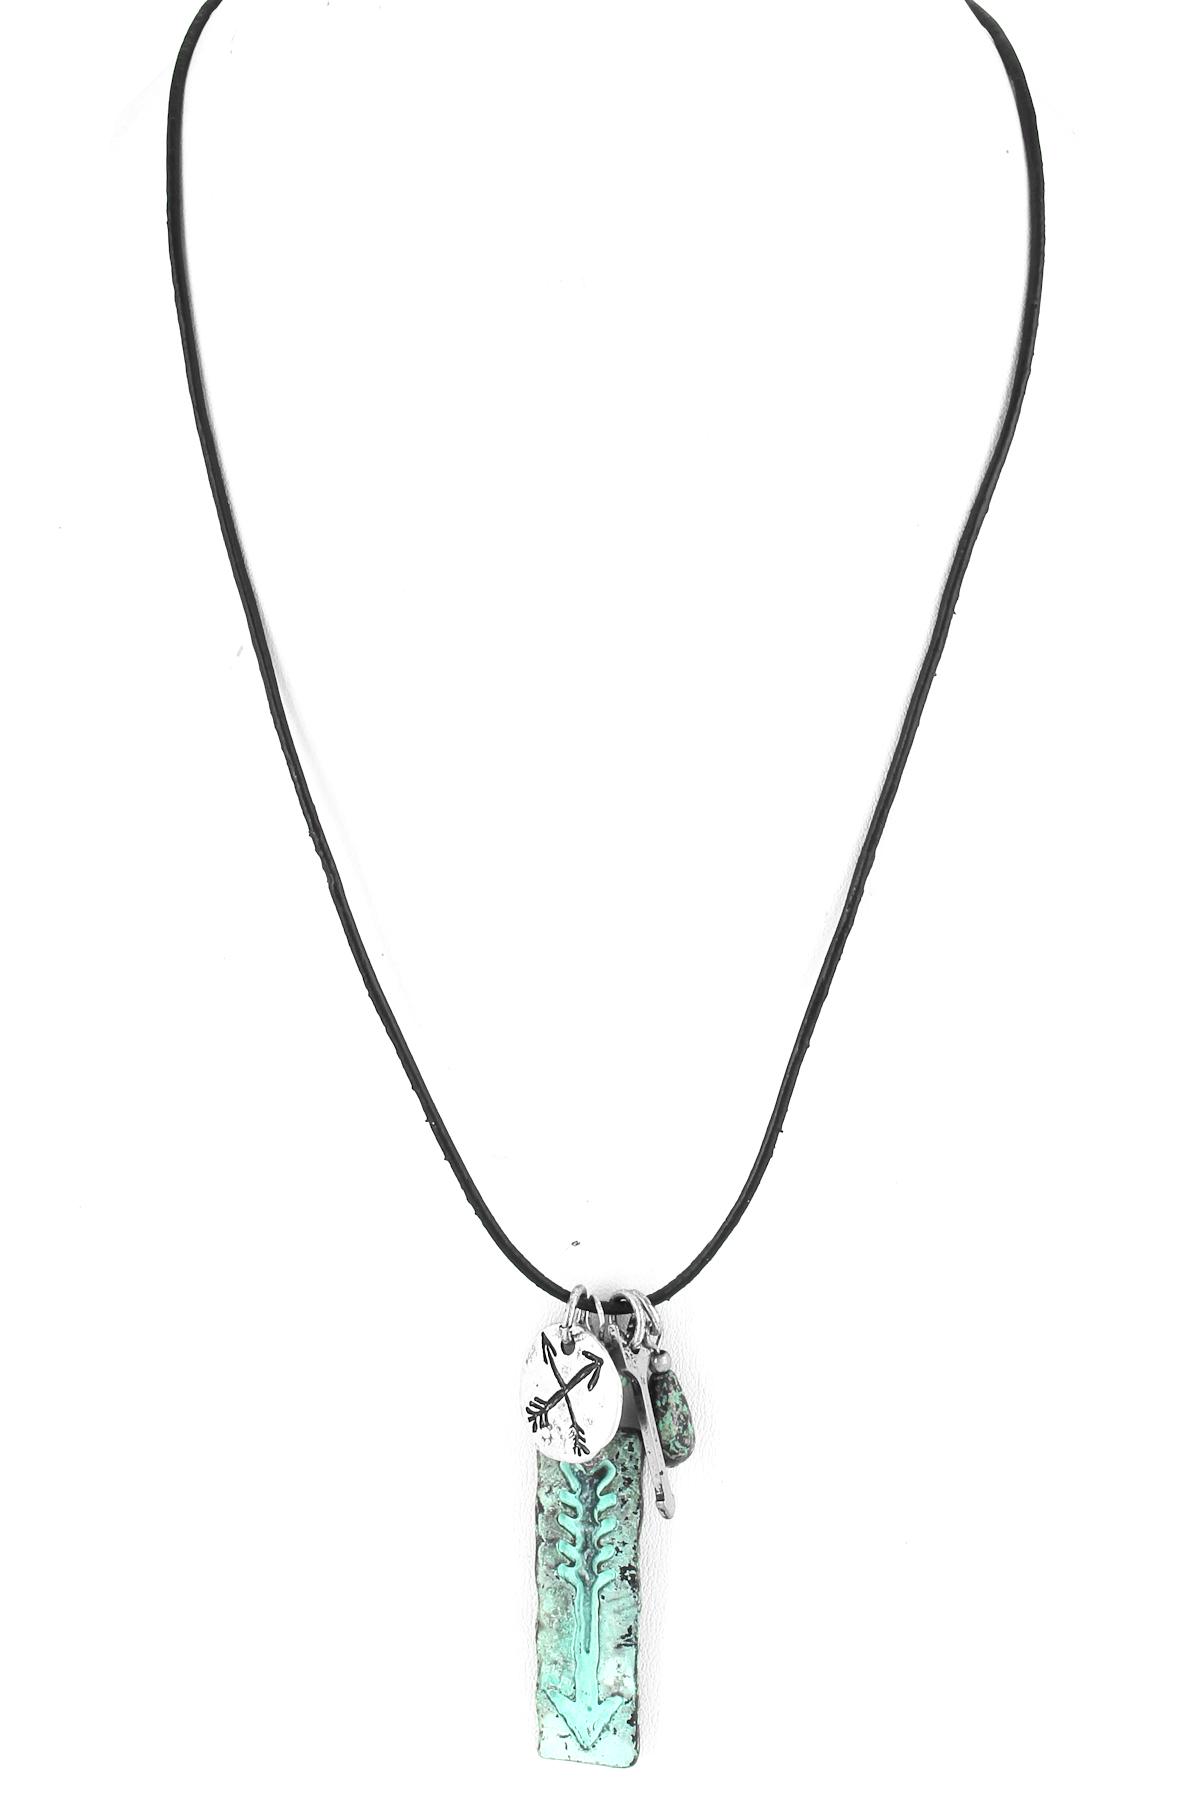 Arrow Pendant Wax Cord Necklace Set